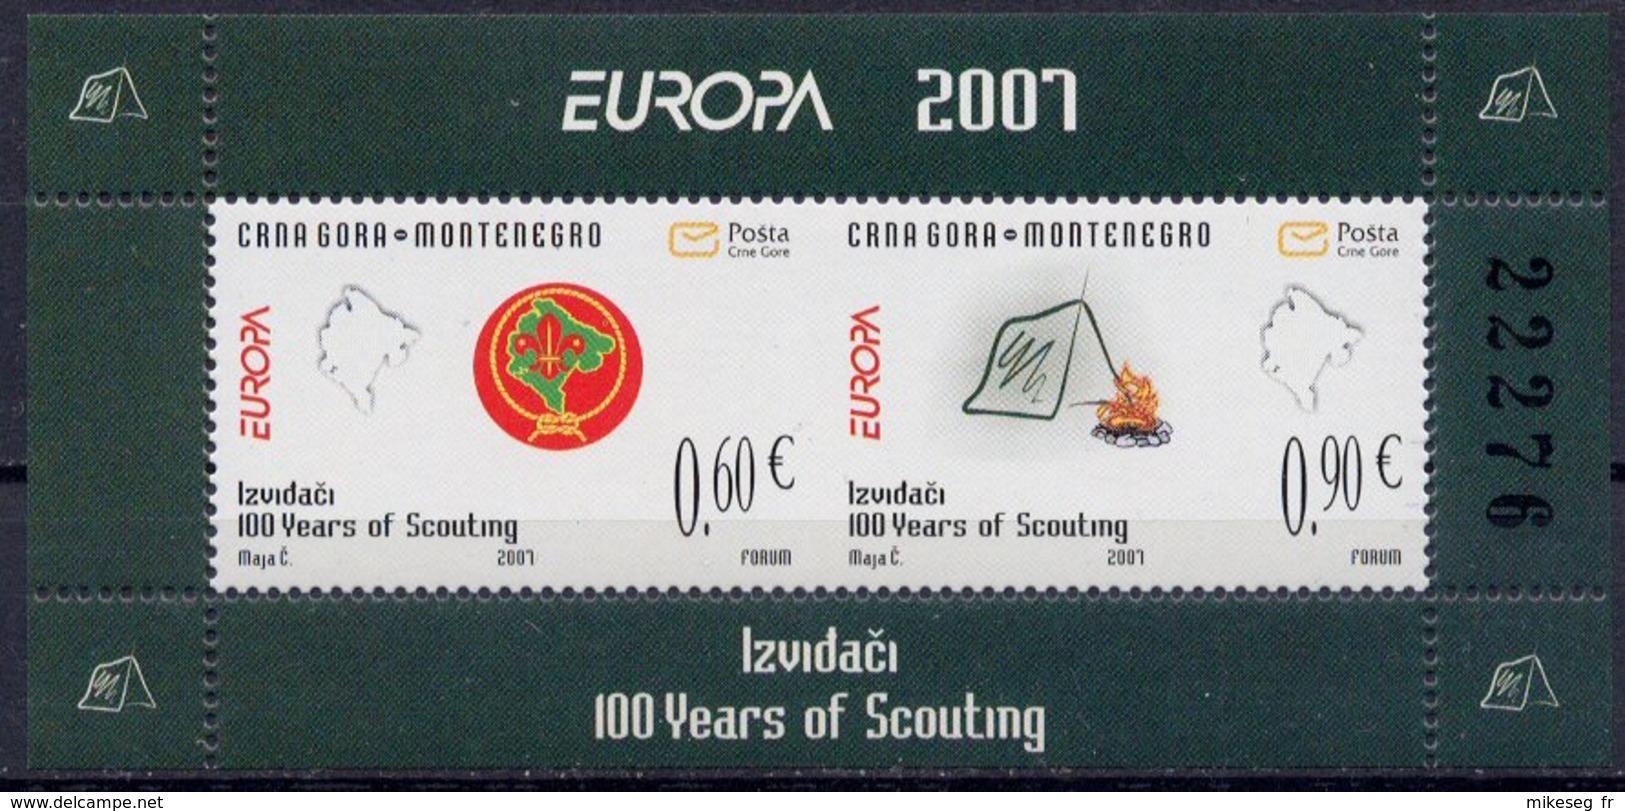 Europa 2007 - CRNA GORA Montenegro (scoutisme) Carnet Booklet Heftchen ** - Europa-CEPT